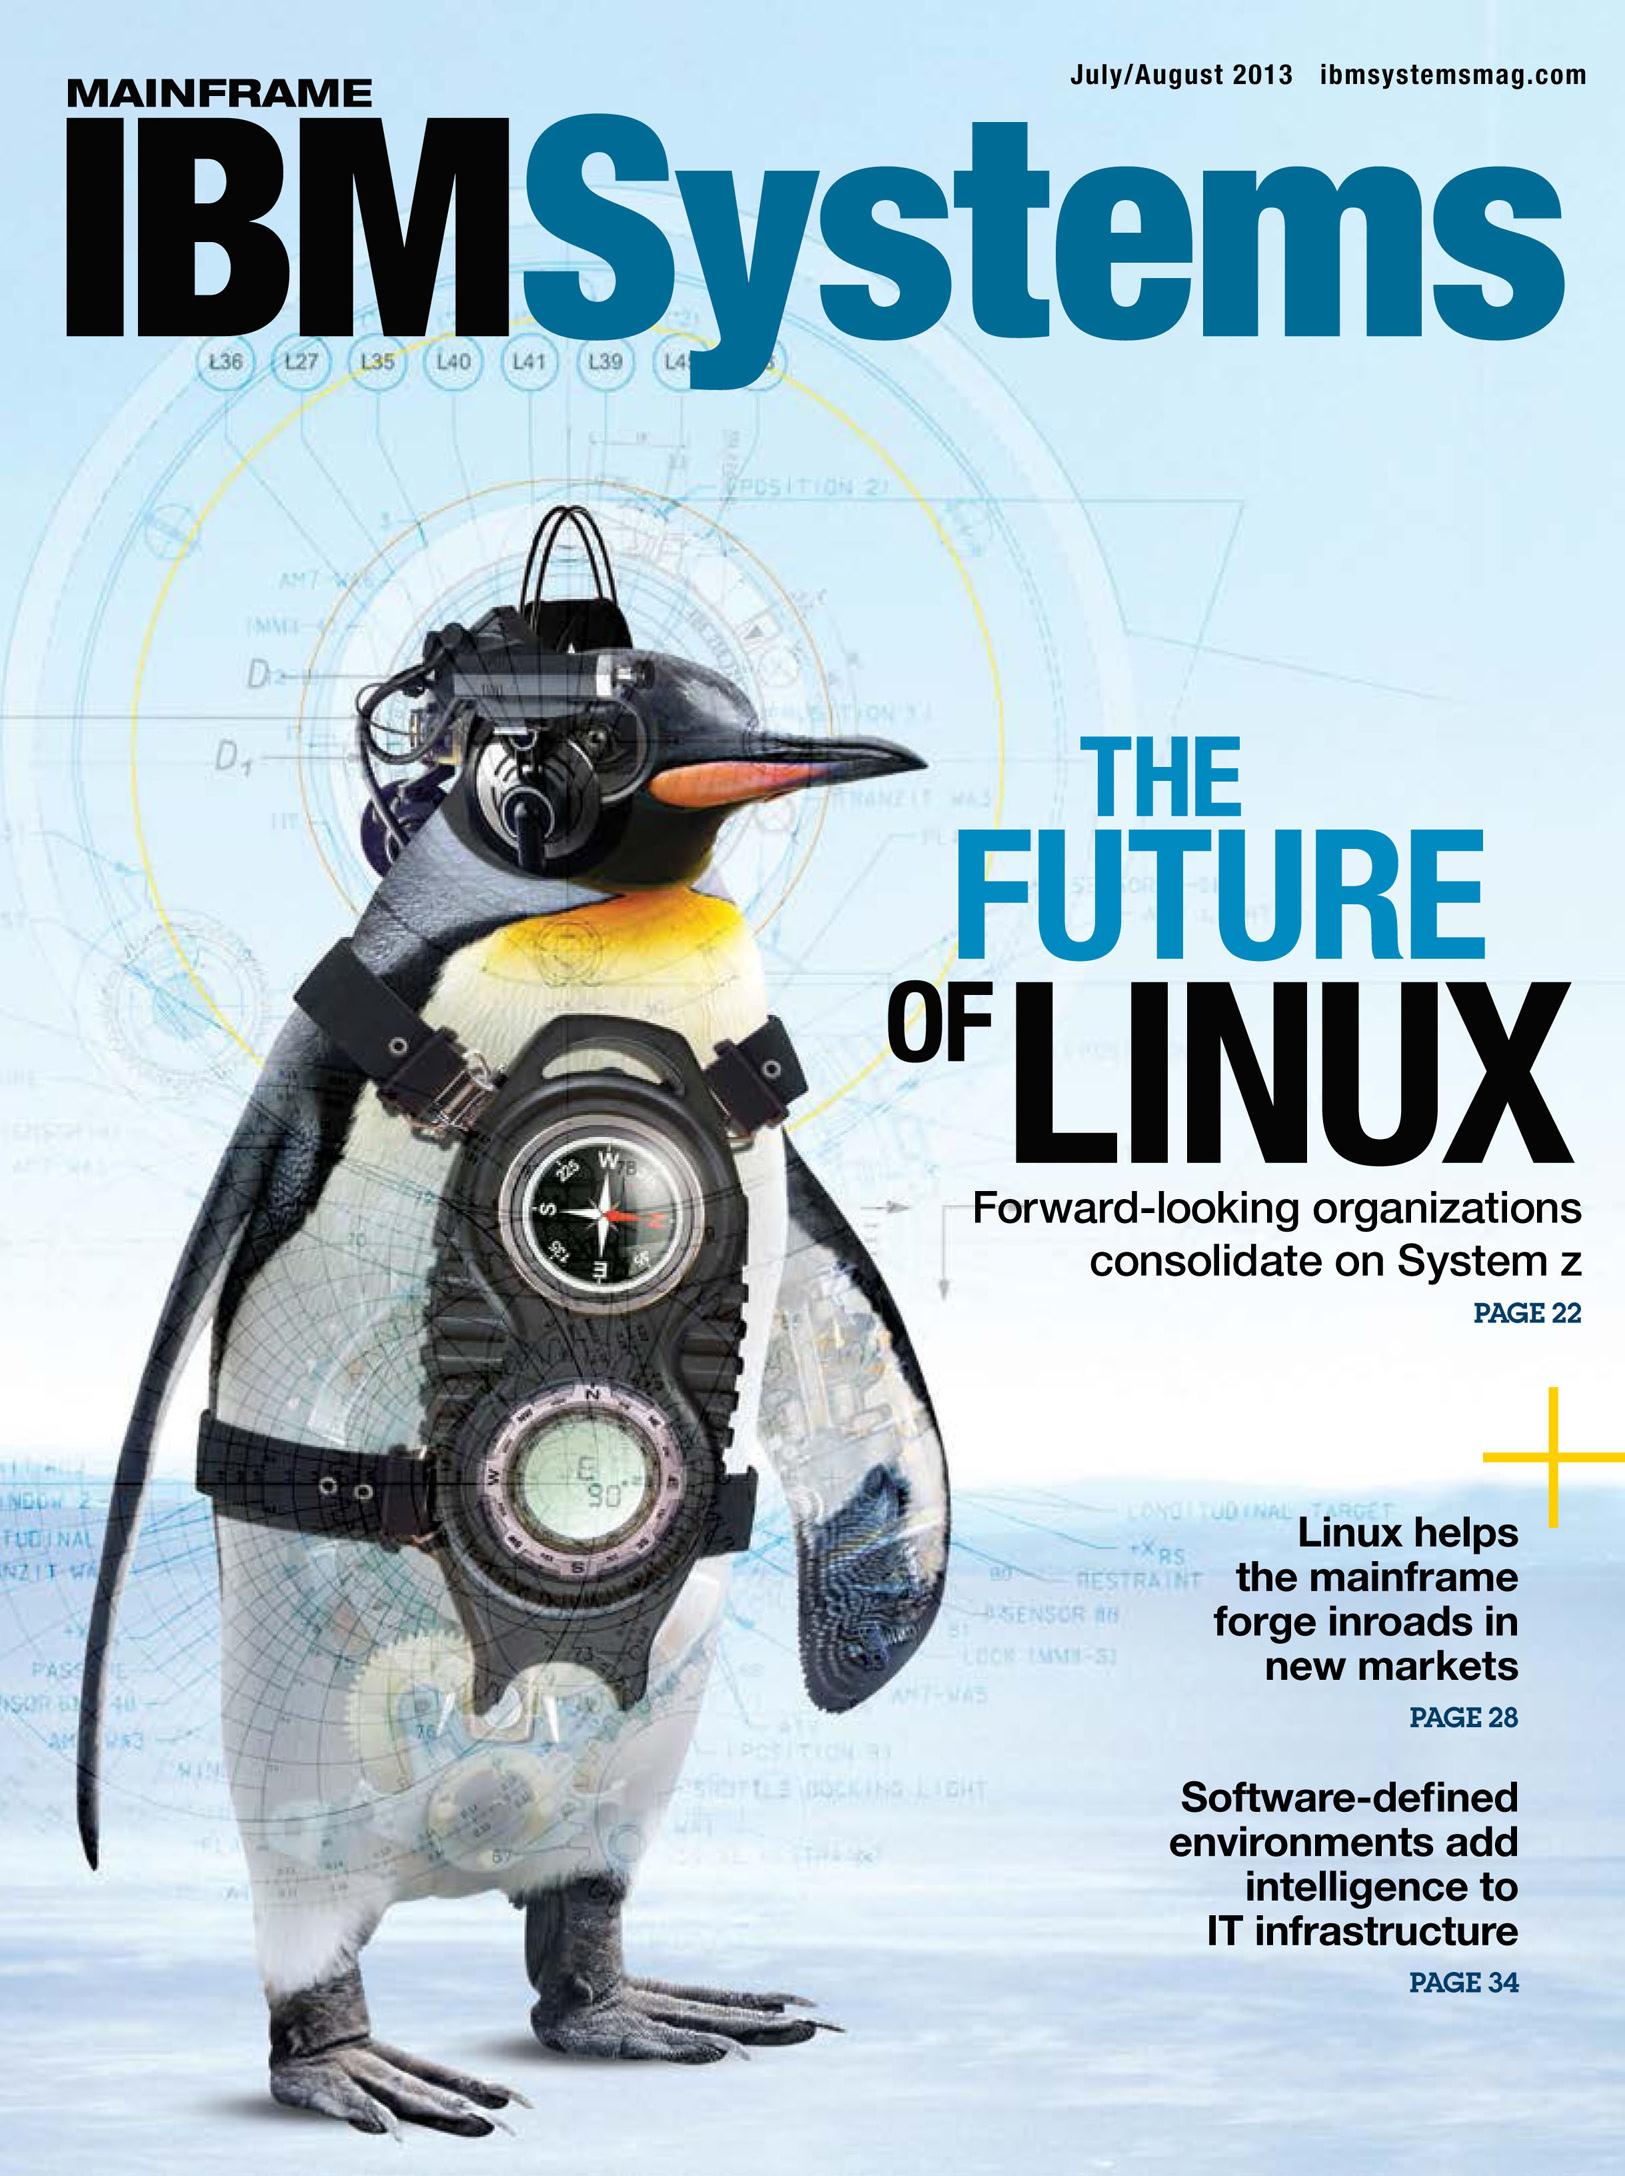 Penguins / IBM Systems